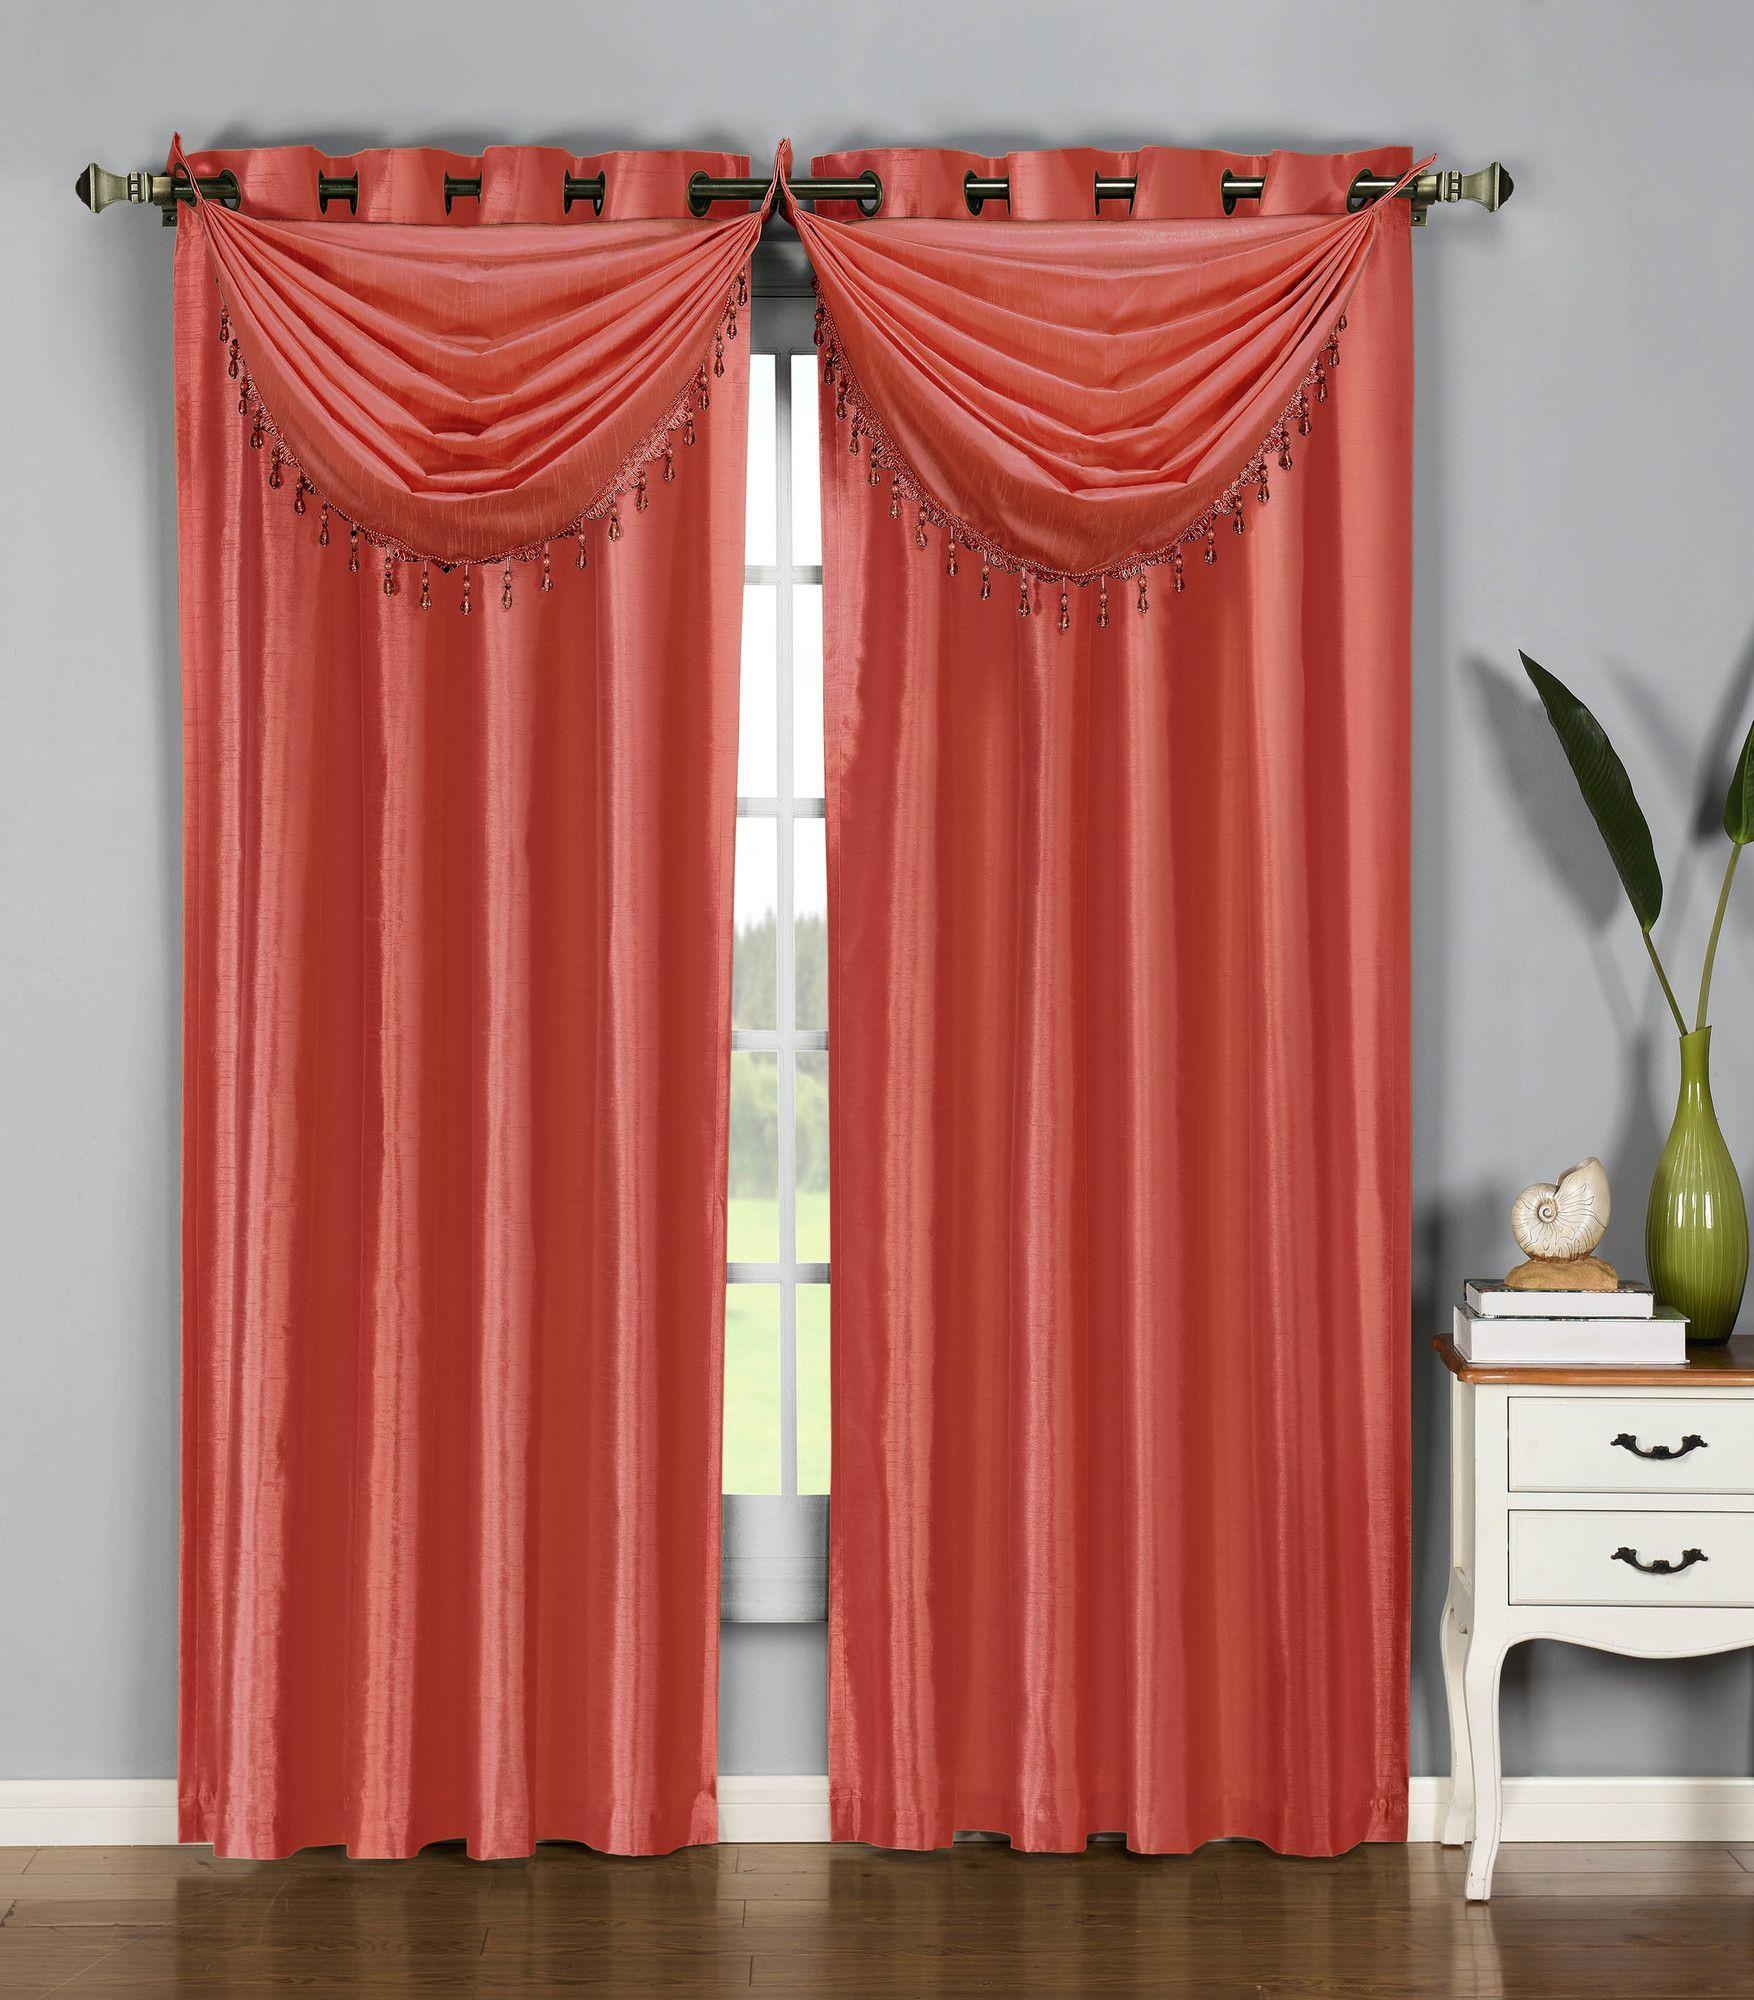 Jamie faux silk waterfall window curtain valance curtains